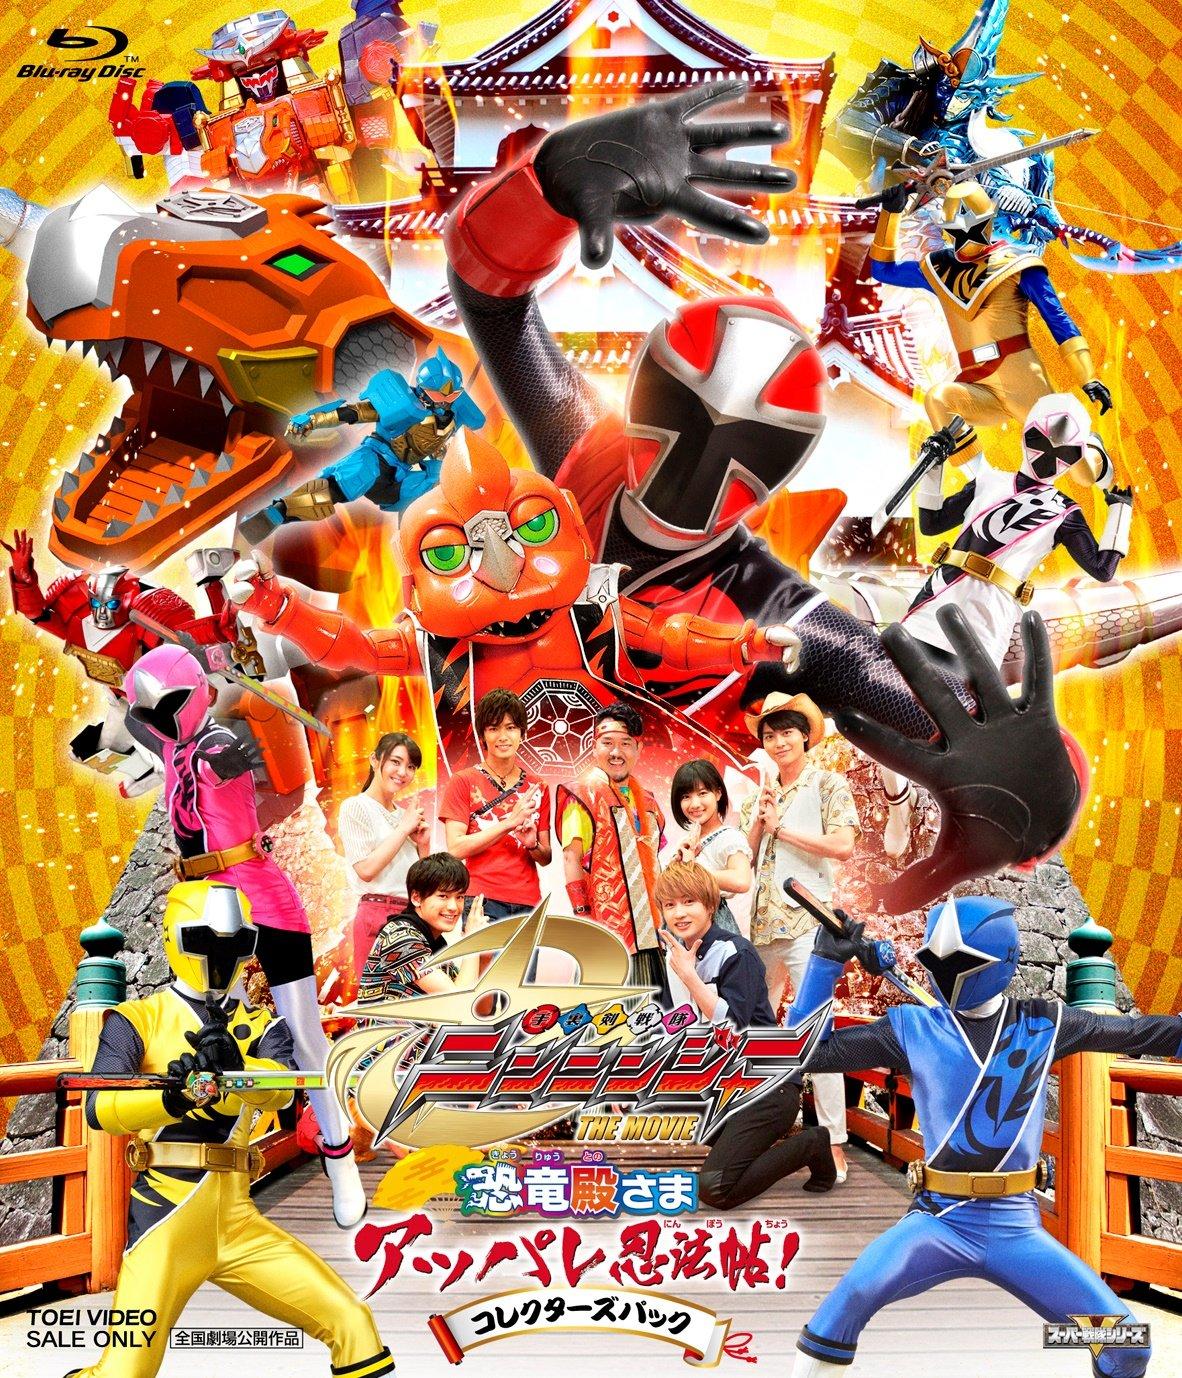 Amazon.com: Sci-Fi Live Action - Shuriken Sentai Ninninger ...